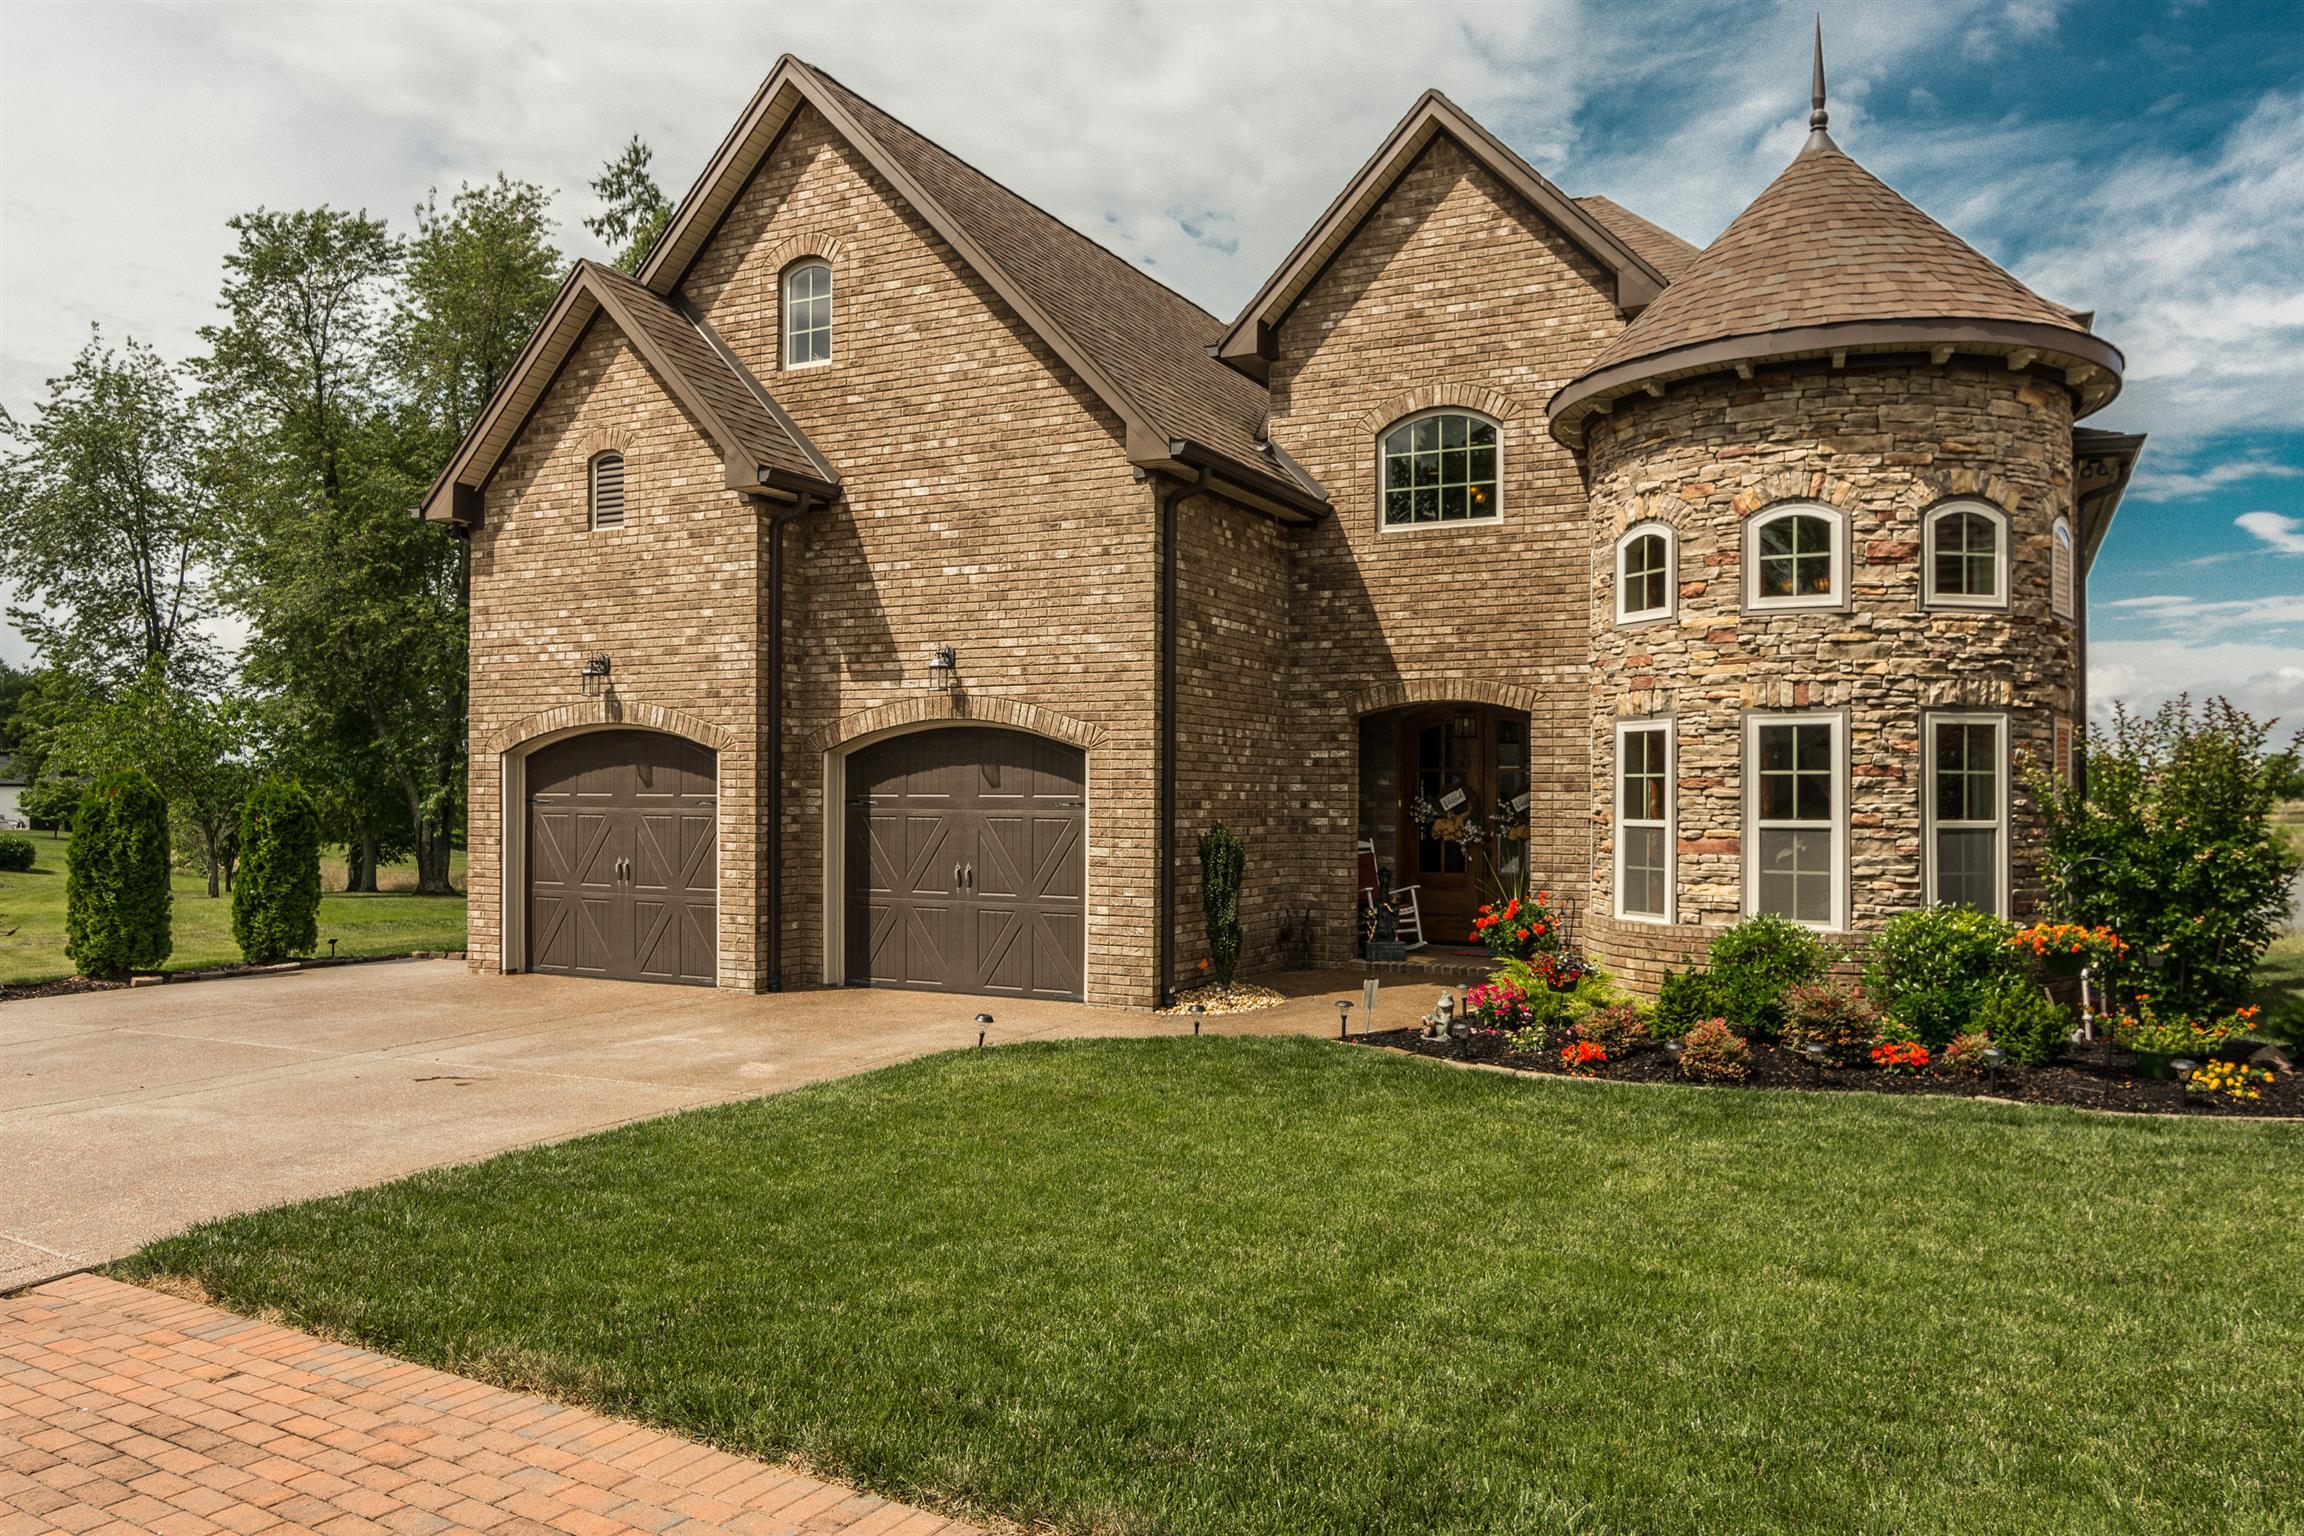 874 Fairington Way, Gallatin, TN 37066 - Gallatin, TN real estate listing